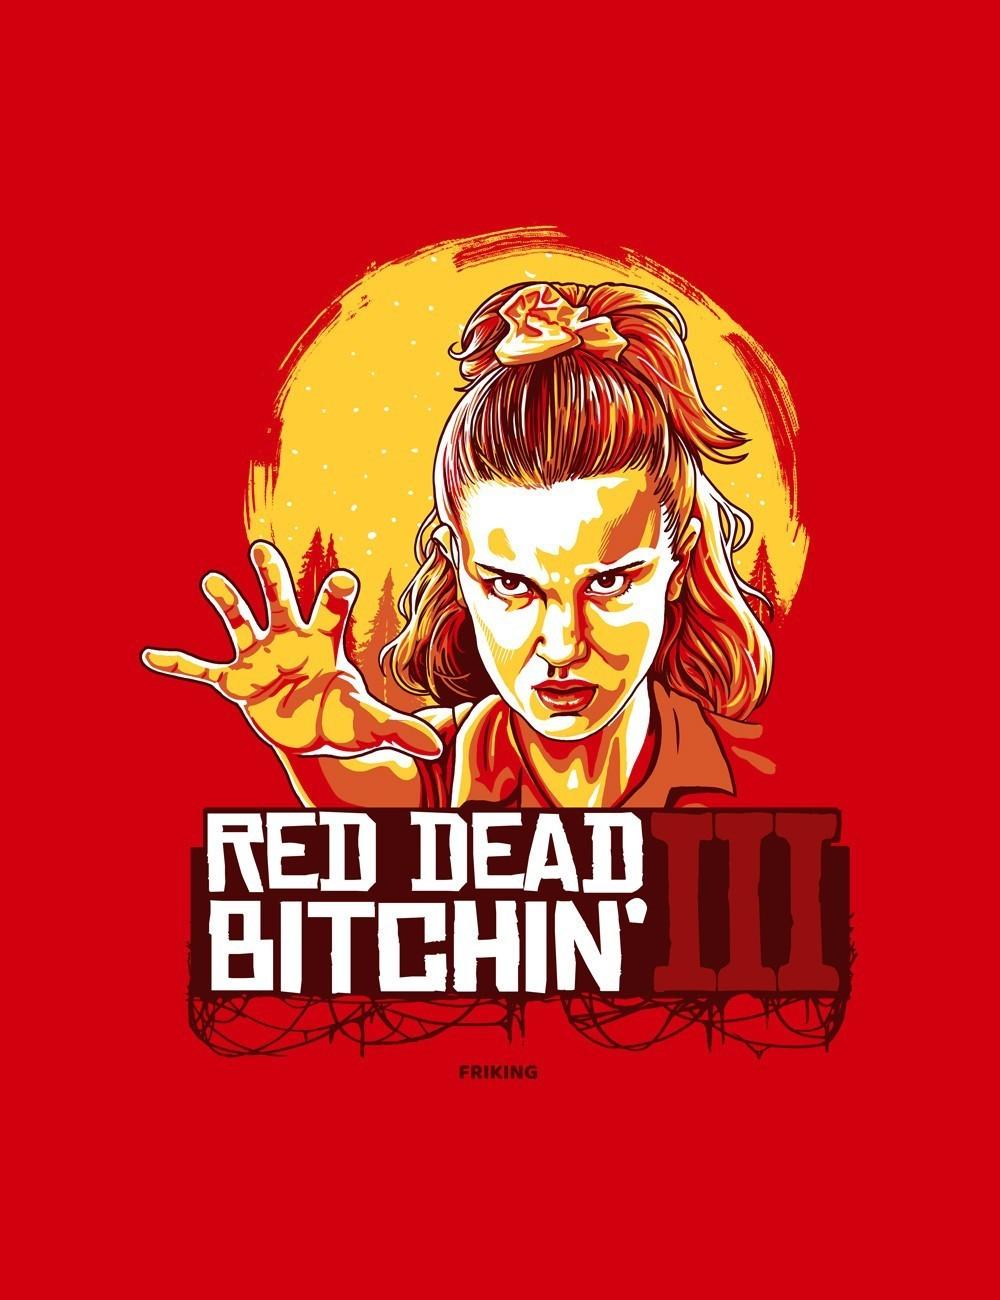 Red Dead Bitchin' 3